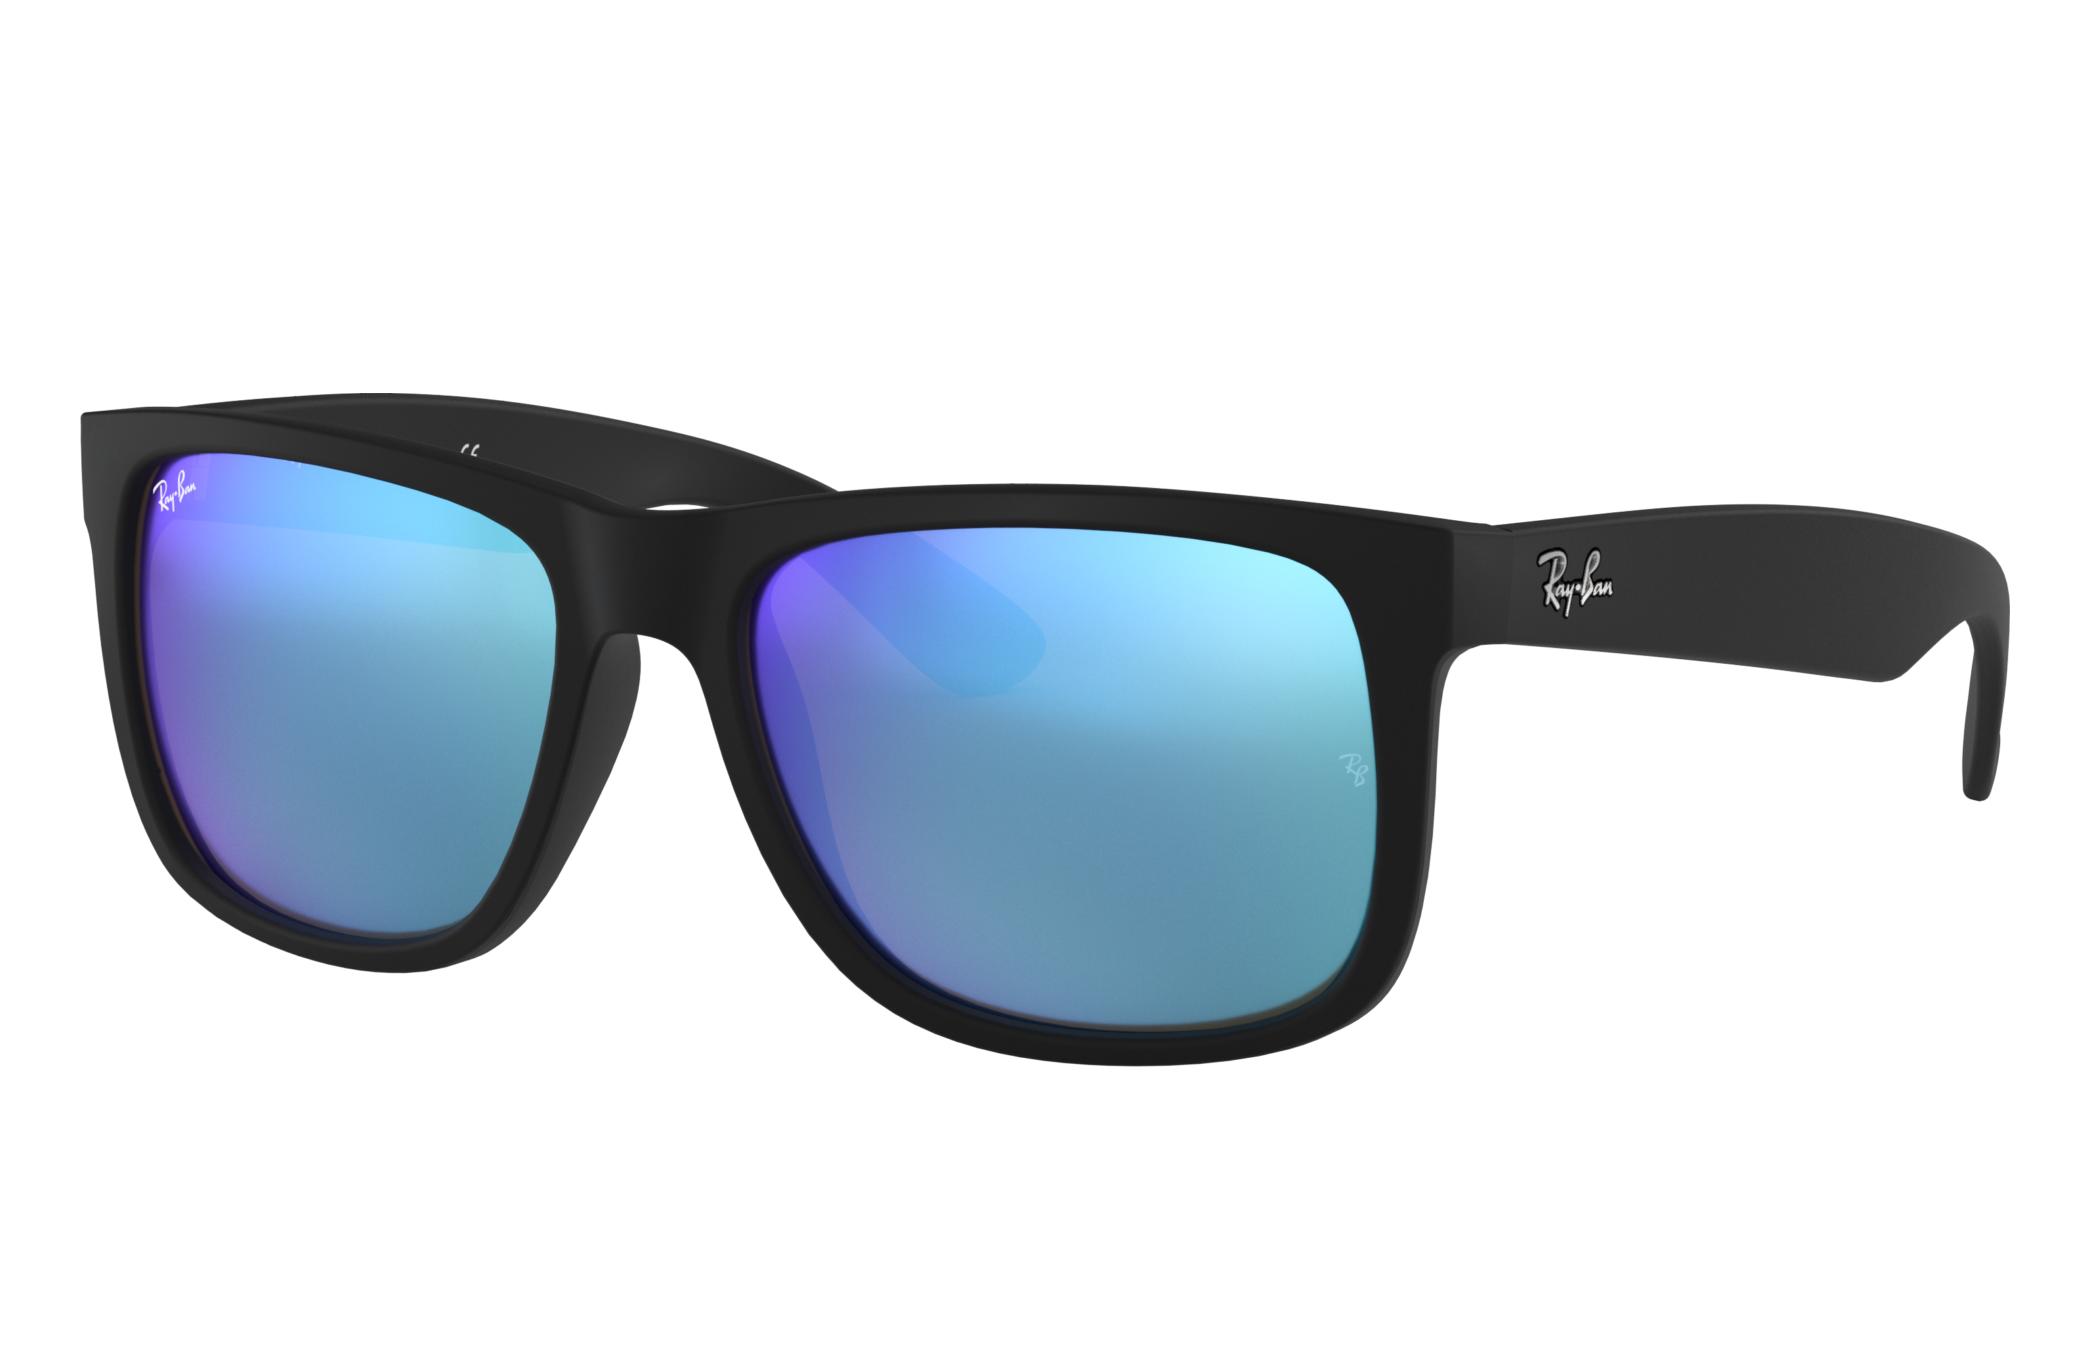 Ray-Ban Justin Color Mix Low Bridge Fit Black, Blue Lenses - RB4165F